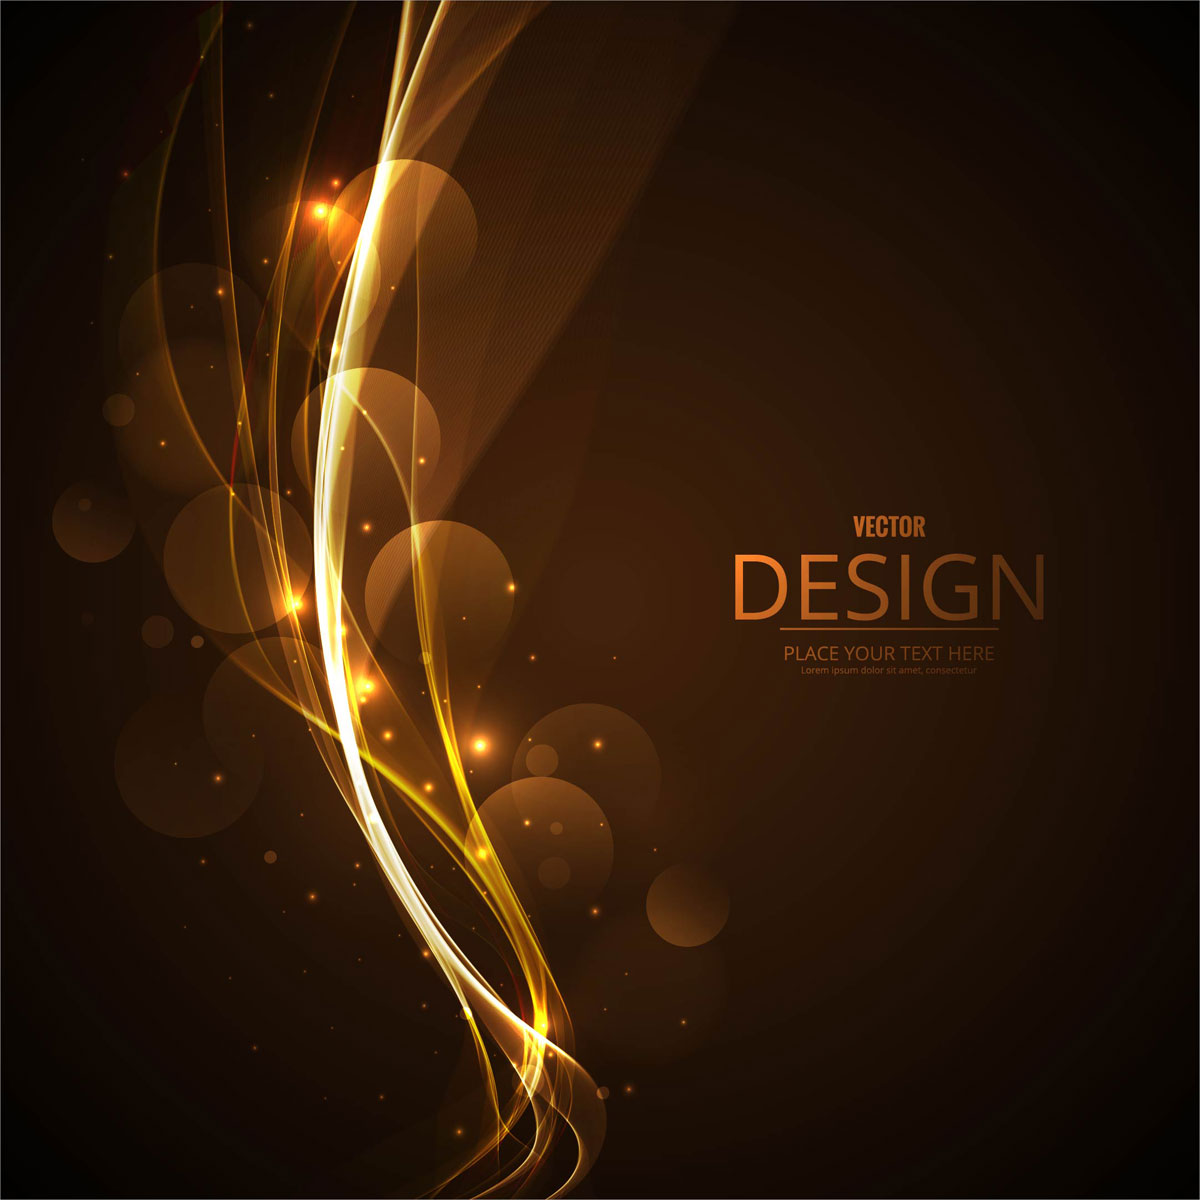 Abstract Business Elegant Wave Background Illustration